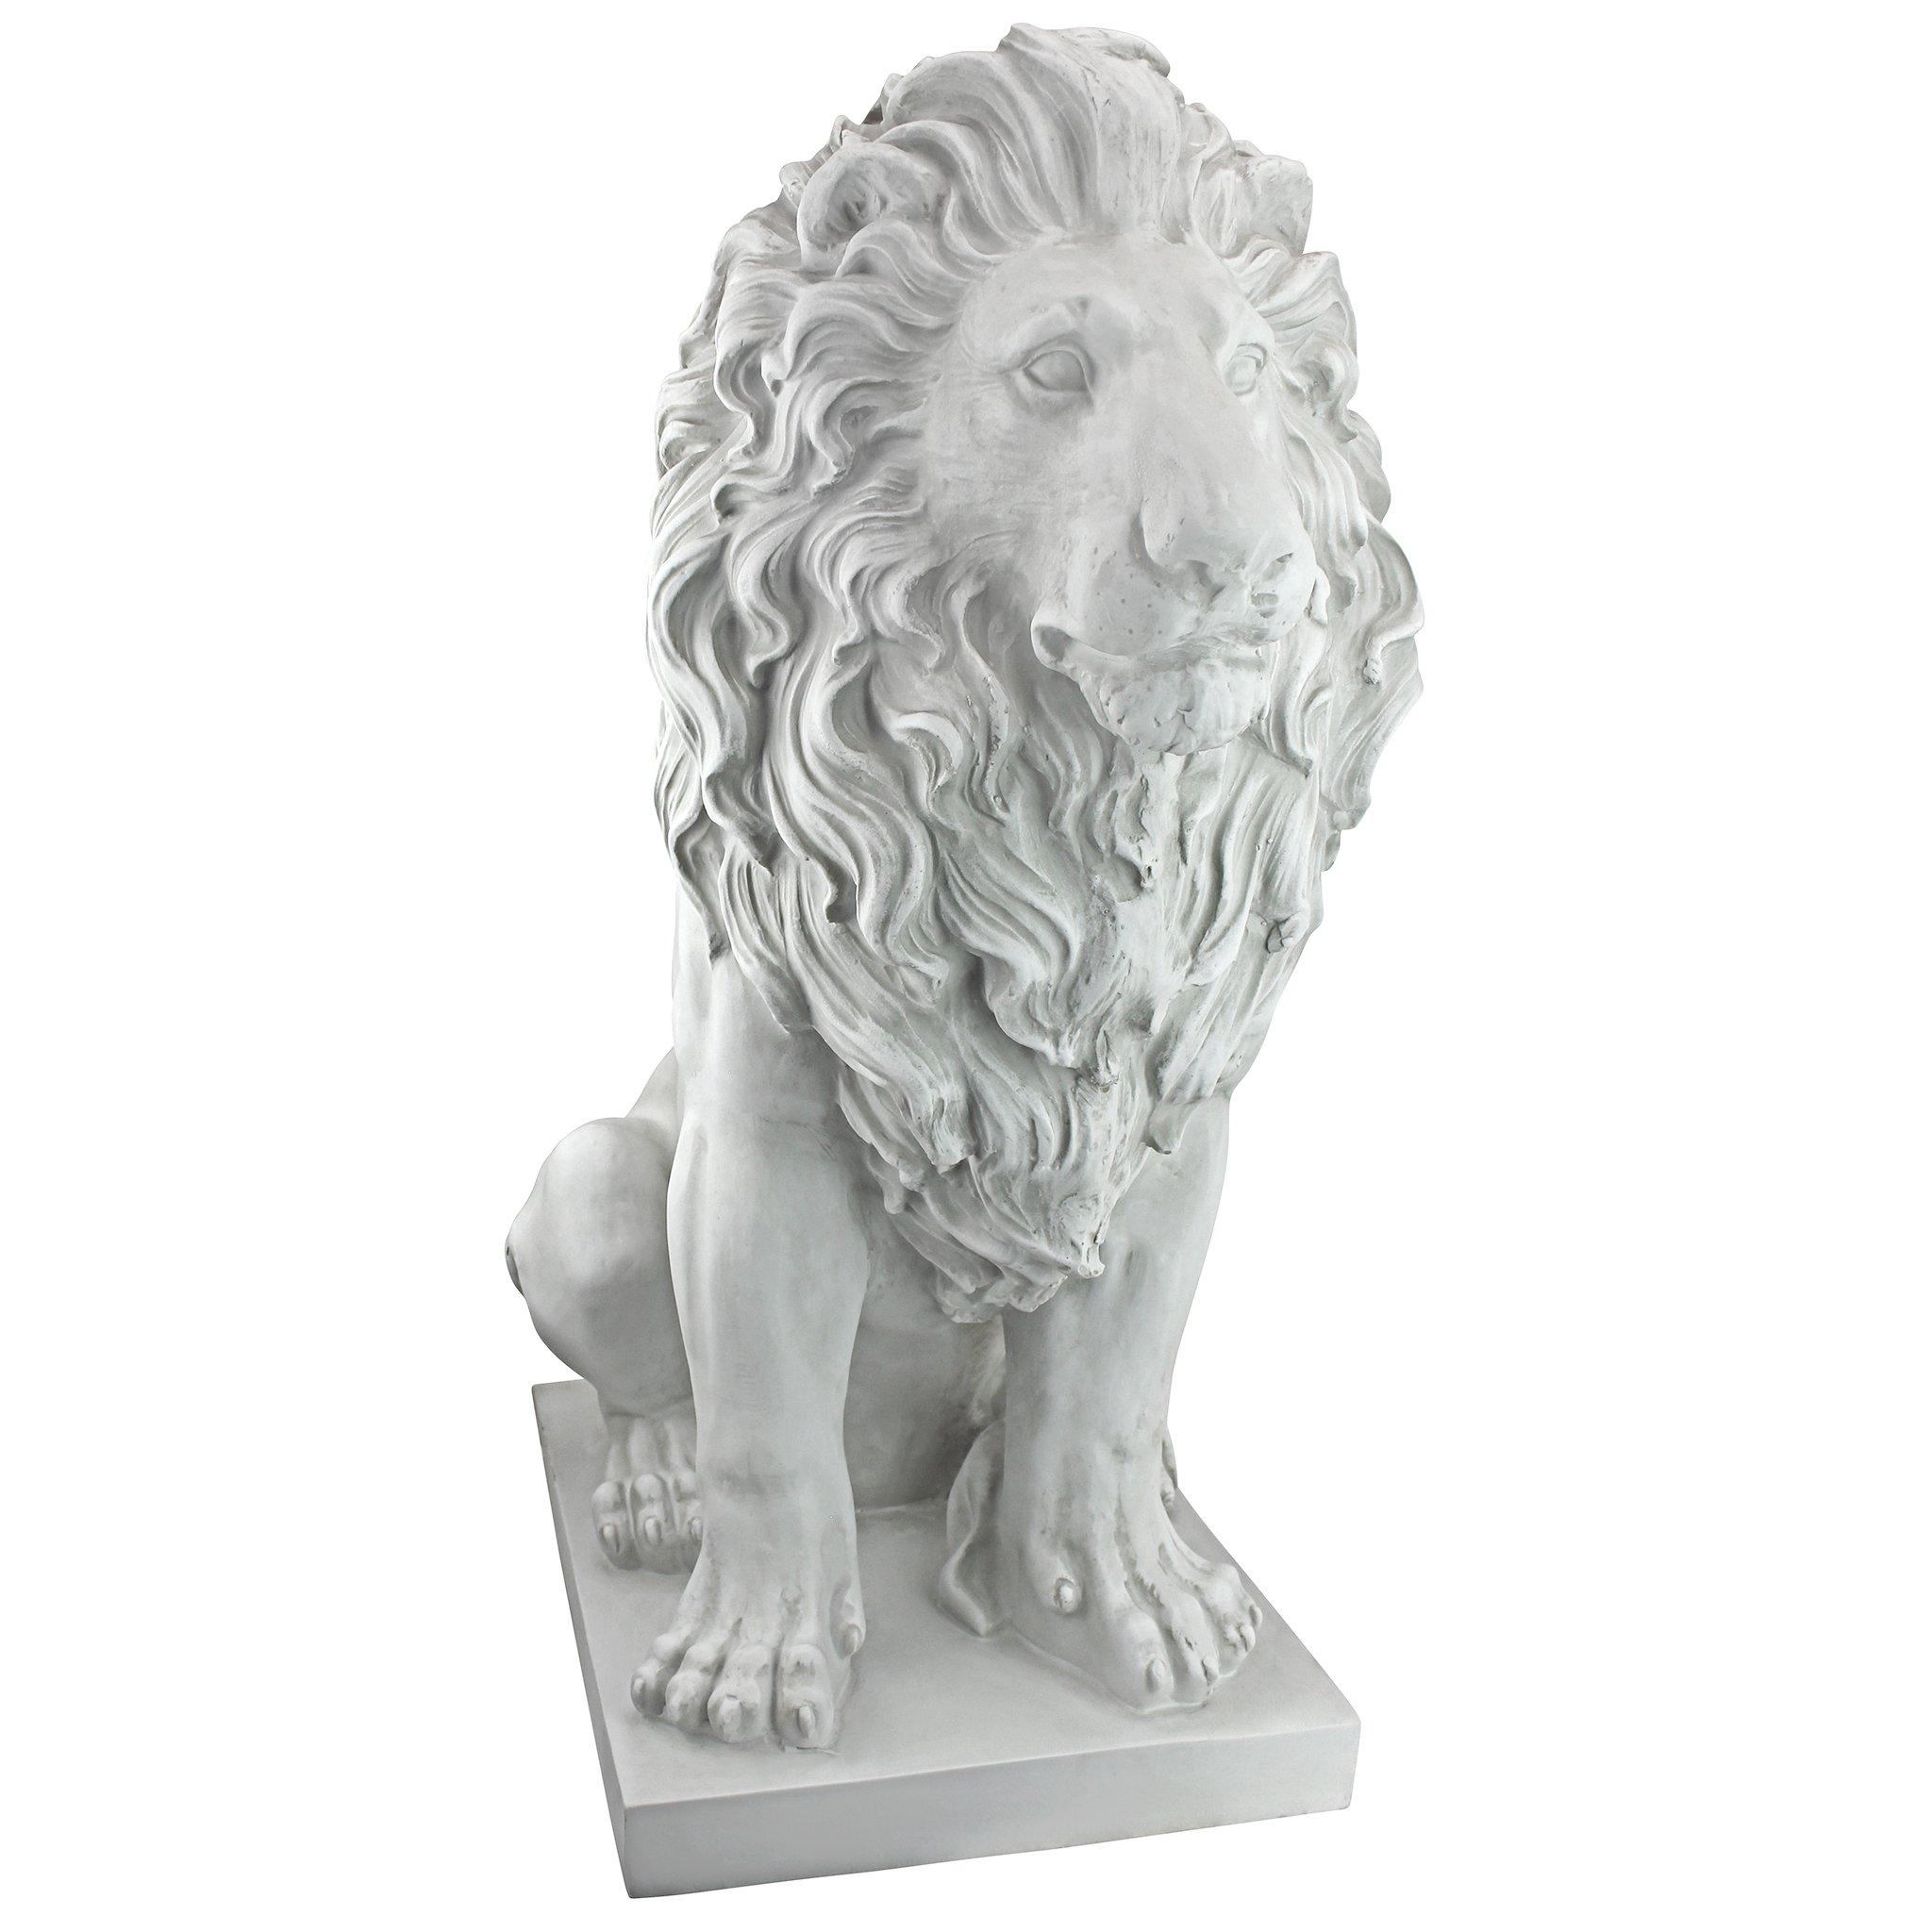 Design Toscano KY71134 Lion of Florence Statue